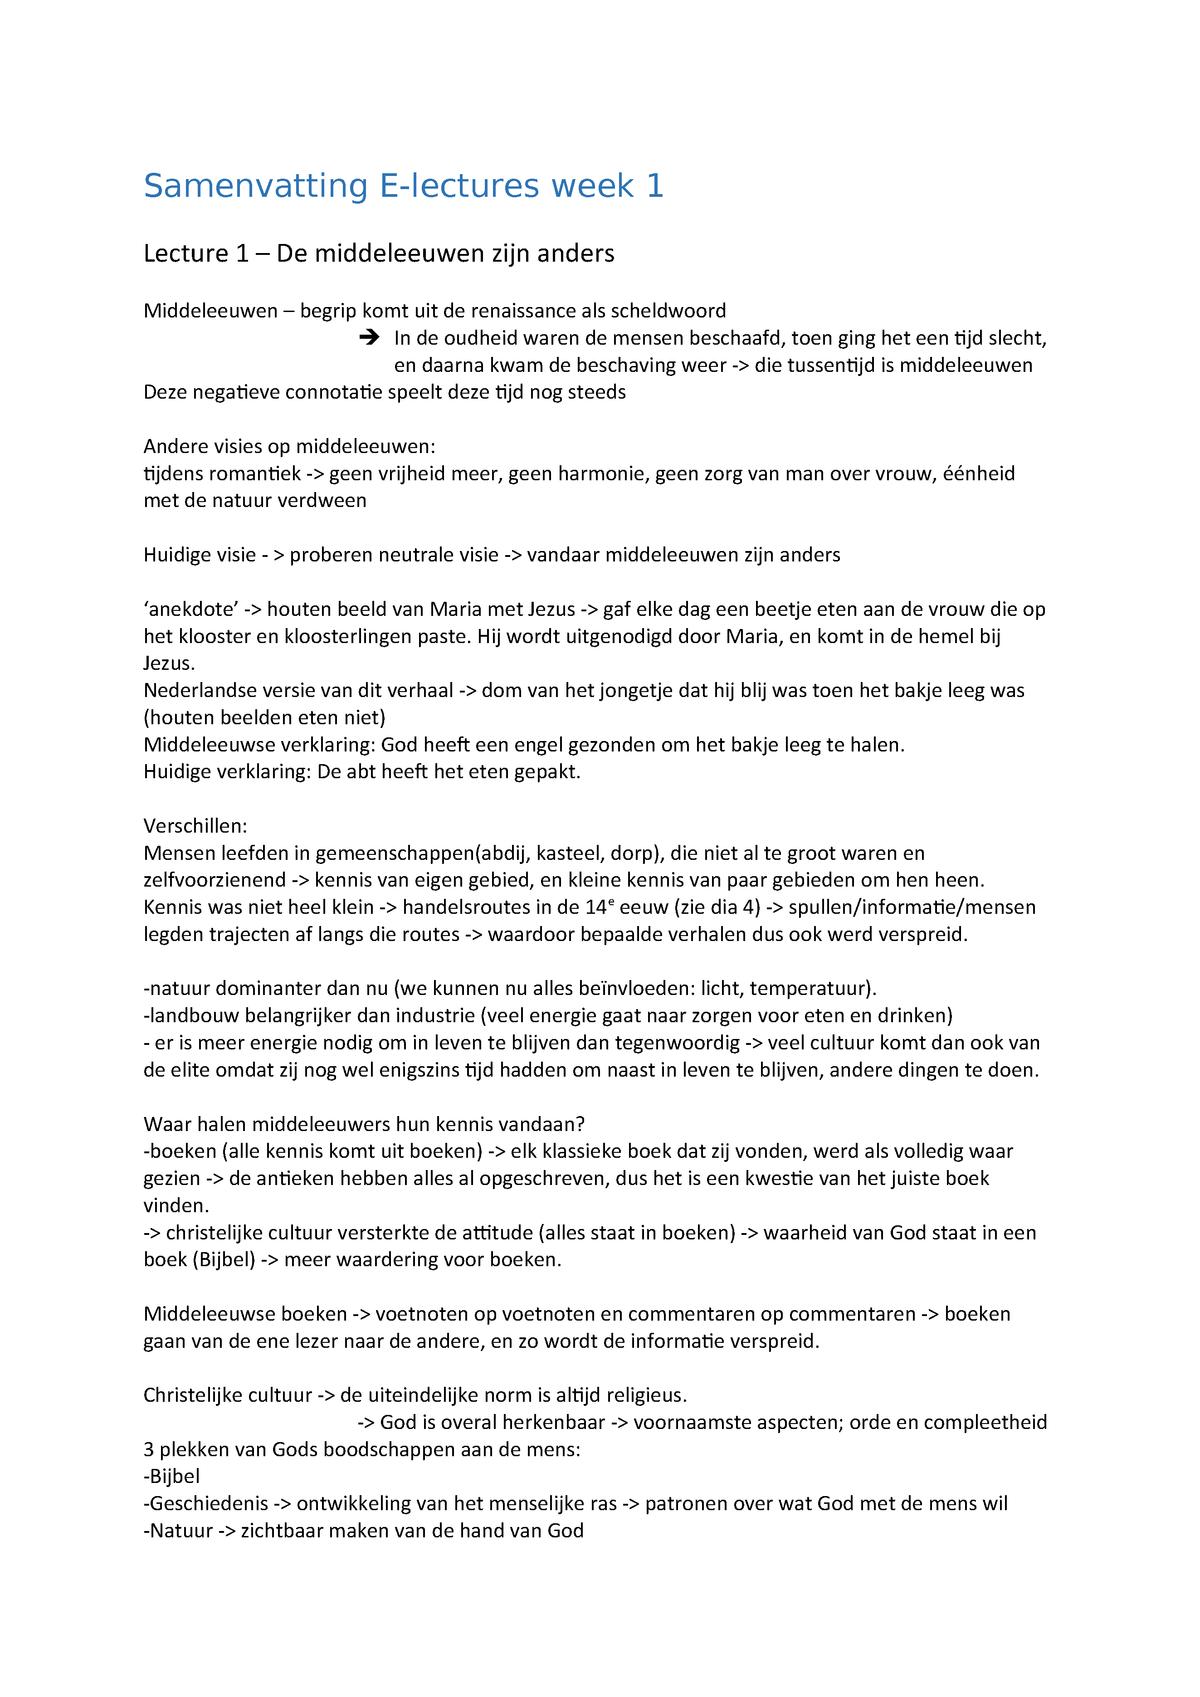 Samenvatting Electures Middeleeuwen - NE2V13003 - StudeerSnel